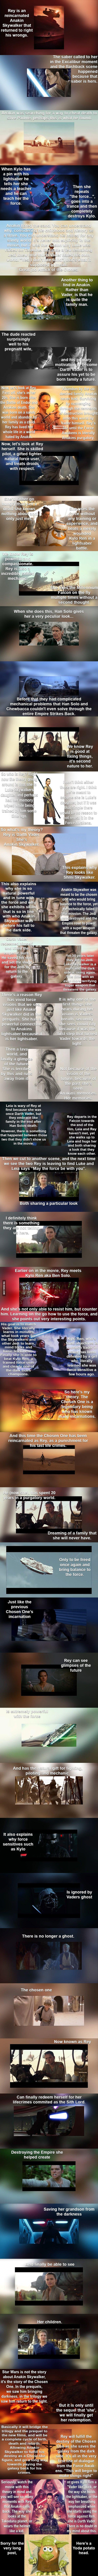 This Star Wars fan theory is brilliant and pretty damn bulletproof   ShortList Magazine